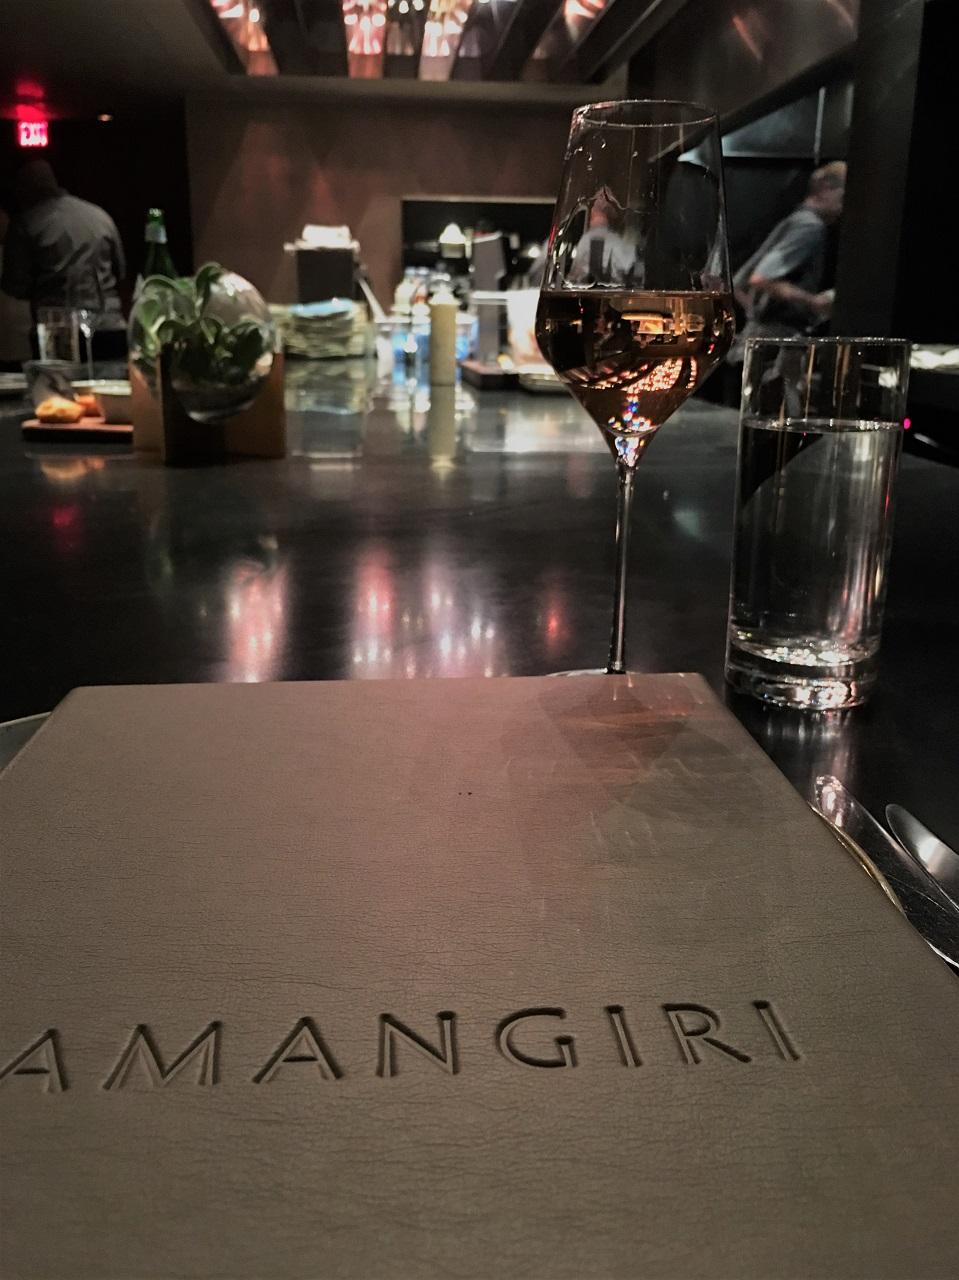 Amangiri アマンギリで食べるネィティブアメリカン メニューとマシュマロBBQ